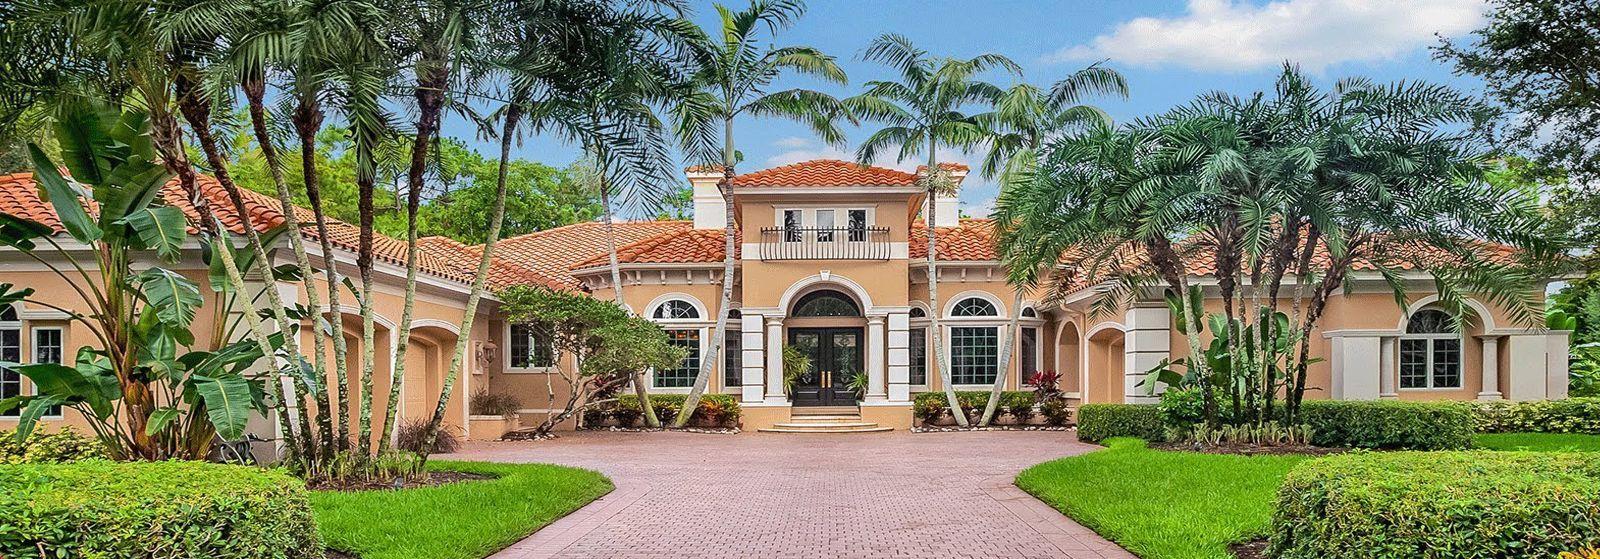 Estate Sales in Fort Lauderdale